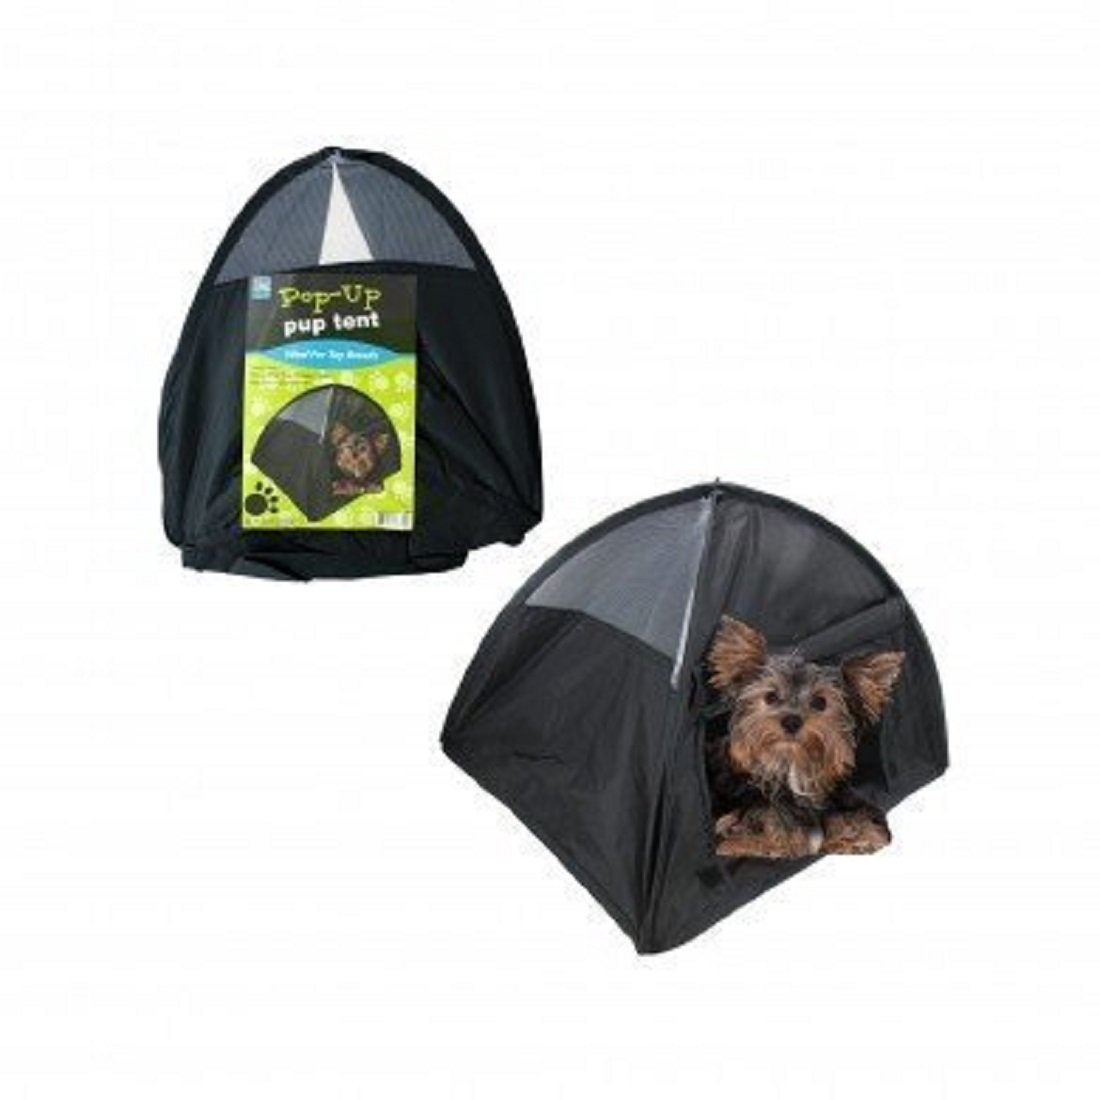 sc 1 st  Amazon.com & Amazon.com : Pop-up Pup Tent : Pet Supplies